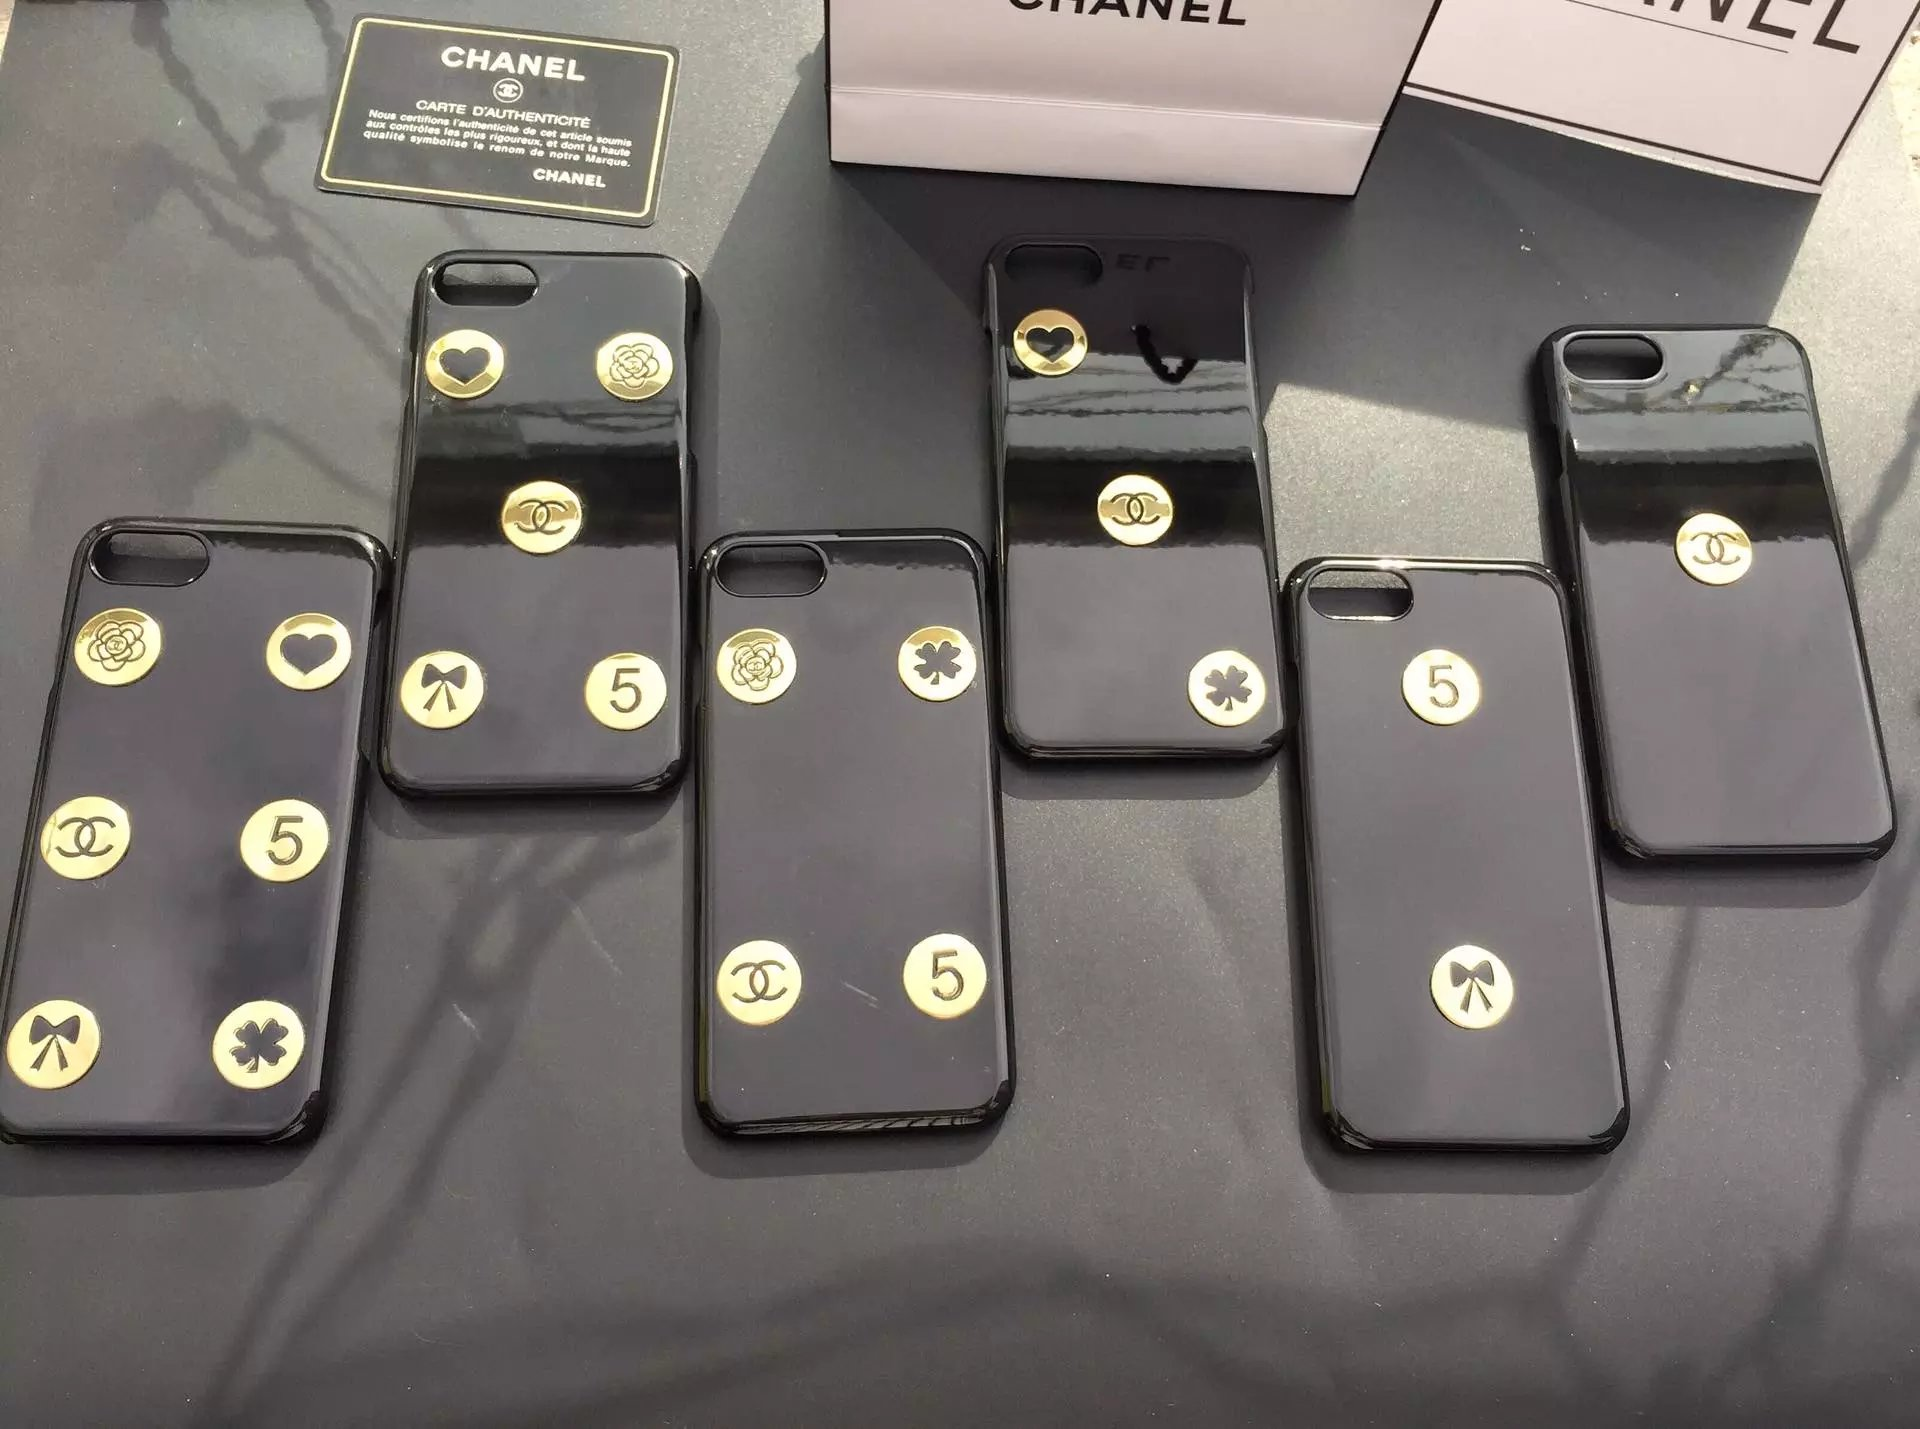 iphone 6s cases best iphone 6s cases designer fashion iphone6s case apple 6s cases phone covers for iphone iphone 6s custom cover cute iphone cases launch of new iphone iphone cases online